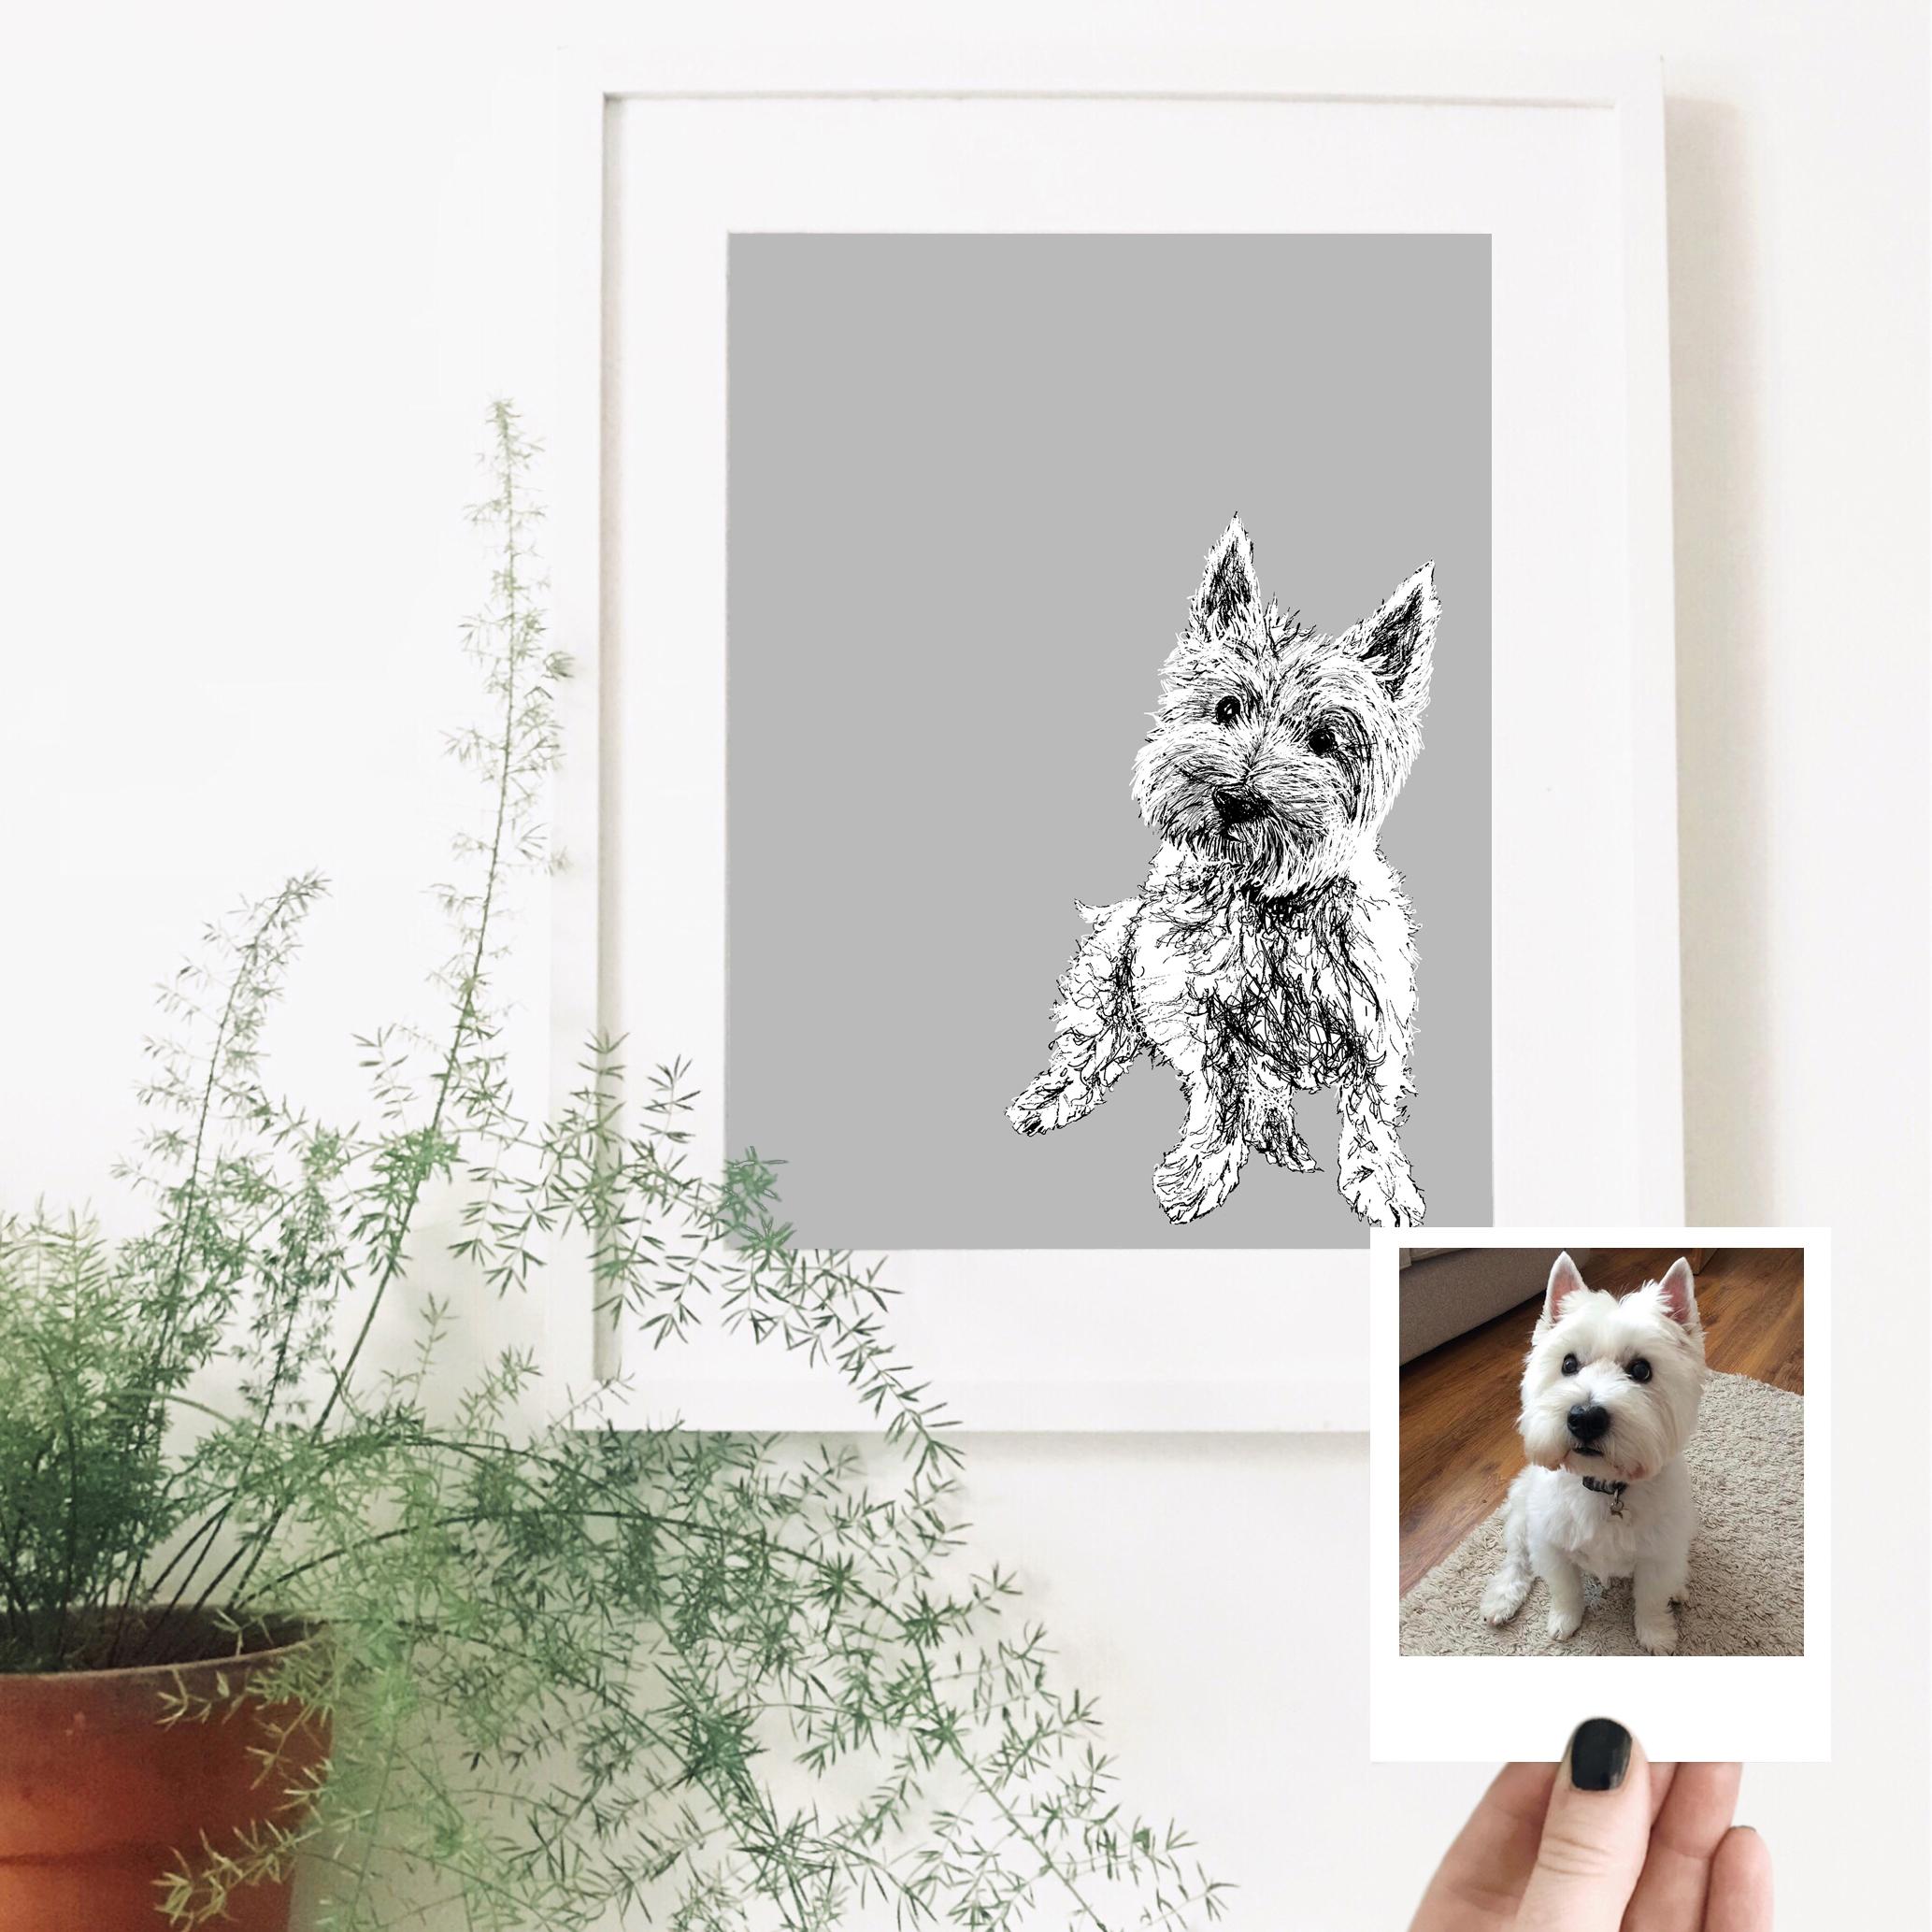 odie-dog-pet-portrait-drawing.jpg